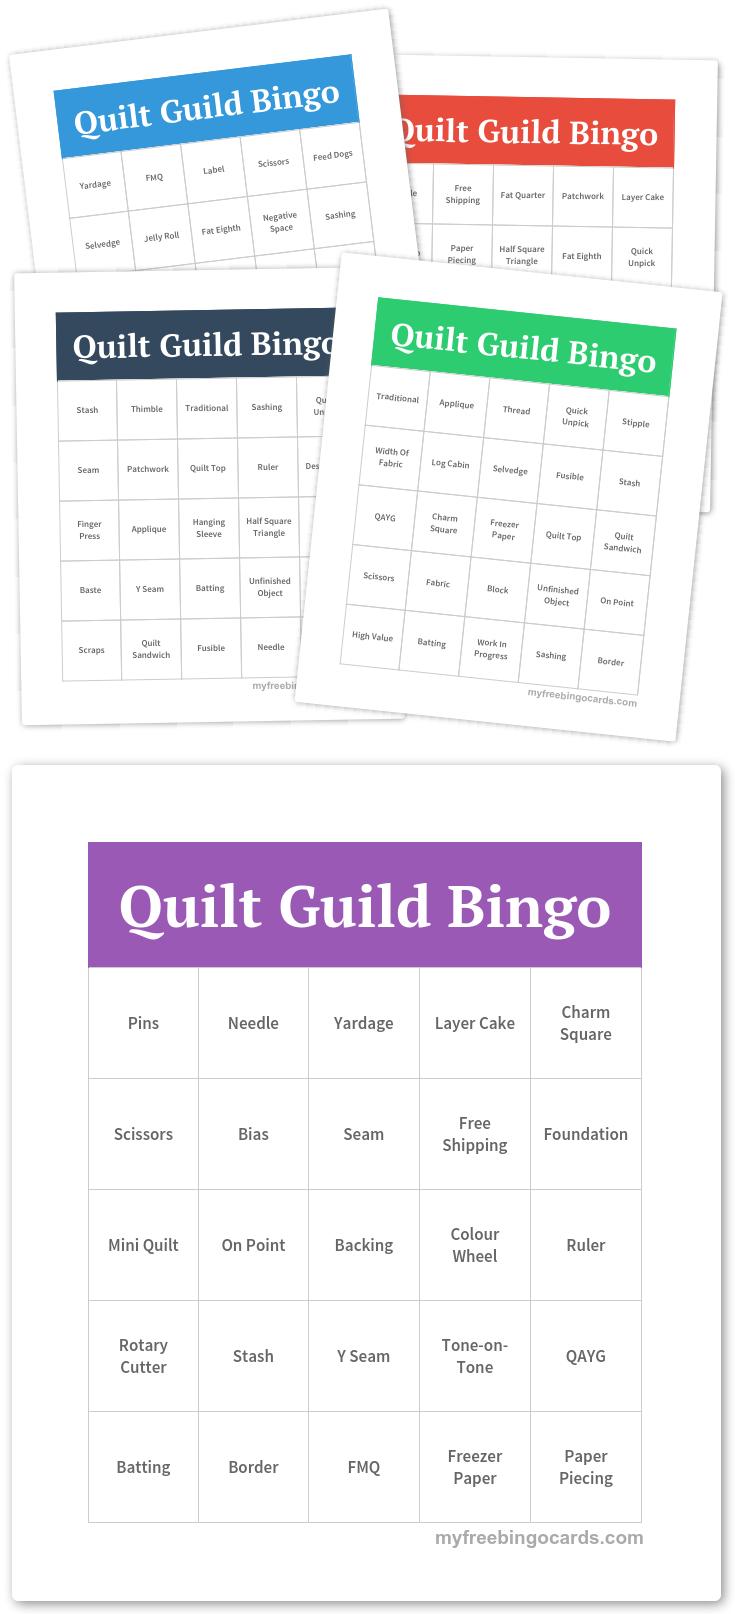 Free Printable Bingo Cards | Bingo Quilt Games | Free Bingo Cards - Free Printable Self Esteem Bingo